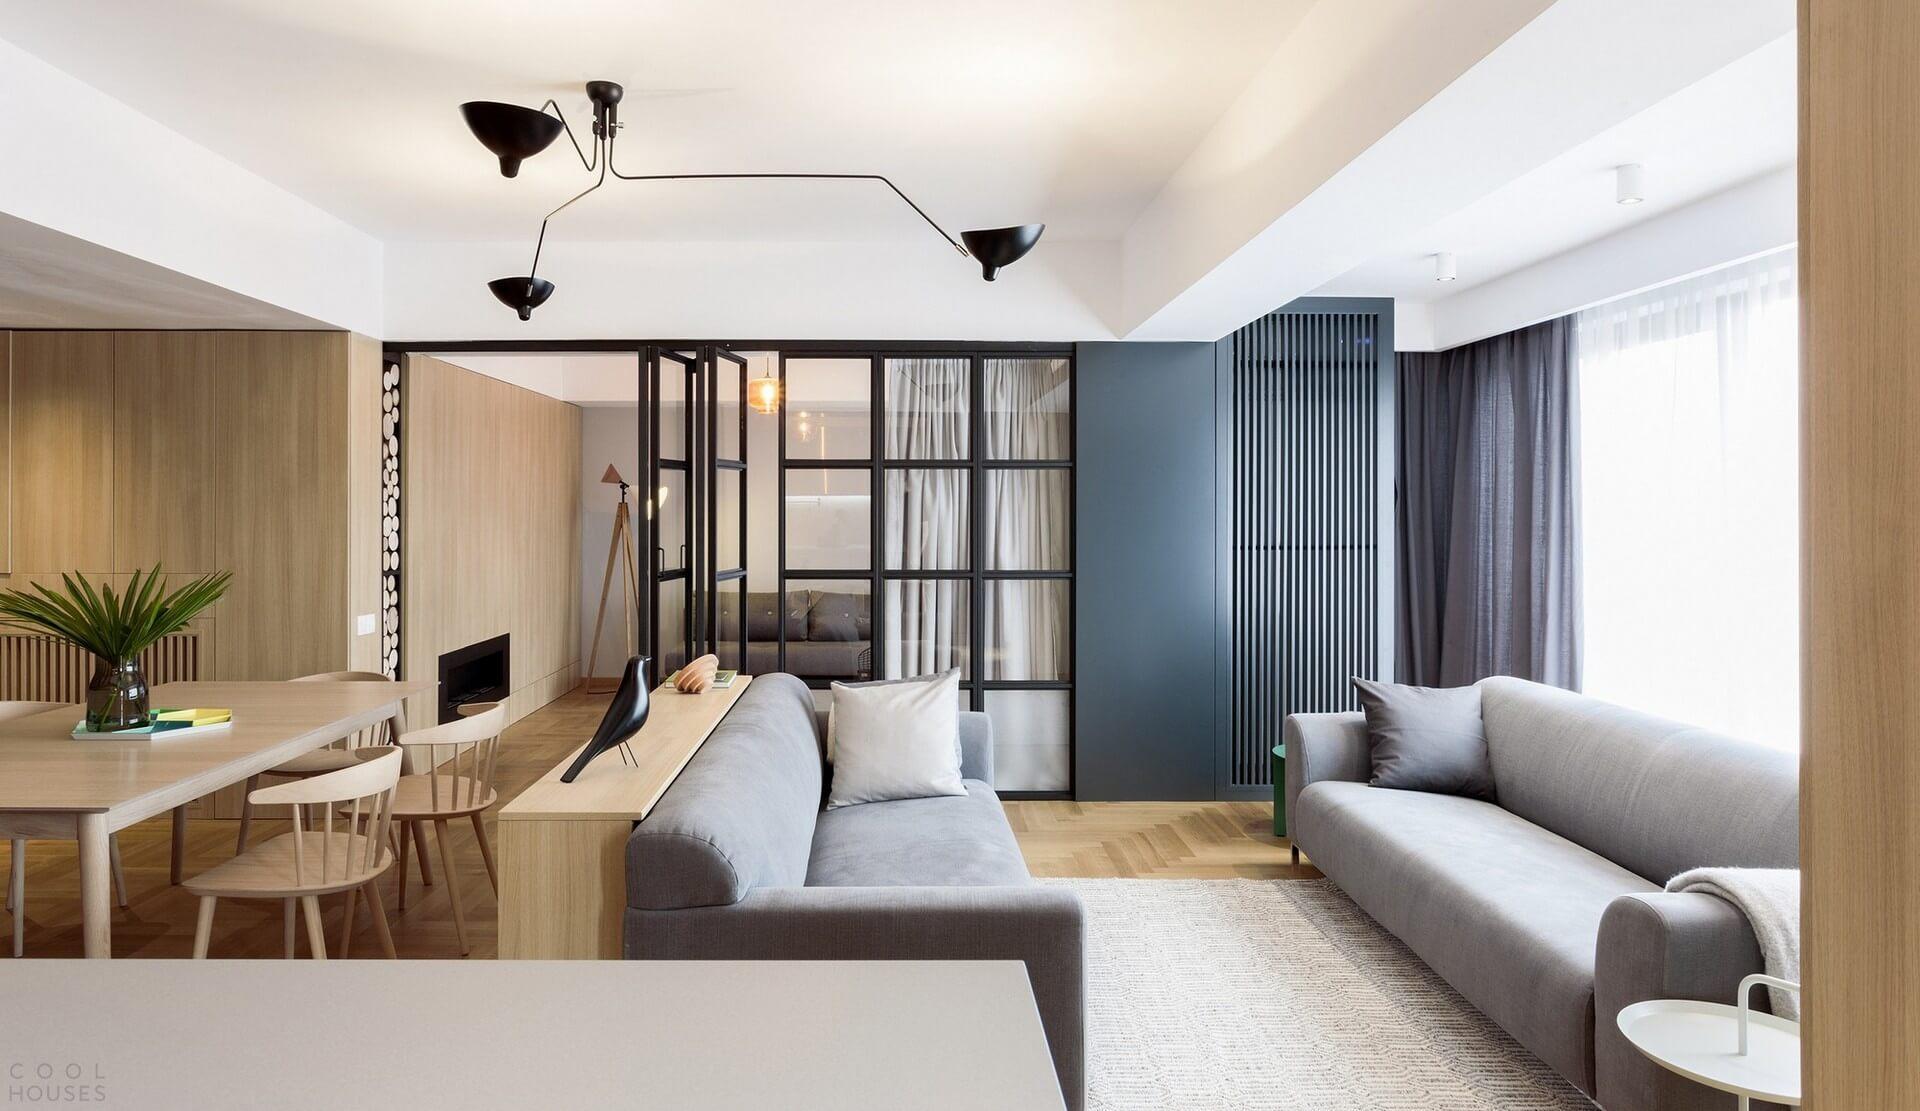 39 апартаментов в популярном комплексе - image 39-apartamentov-v-populyarnom-komplekse-2 on http://bizneskvartal.ru